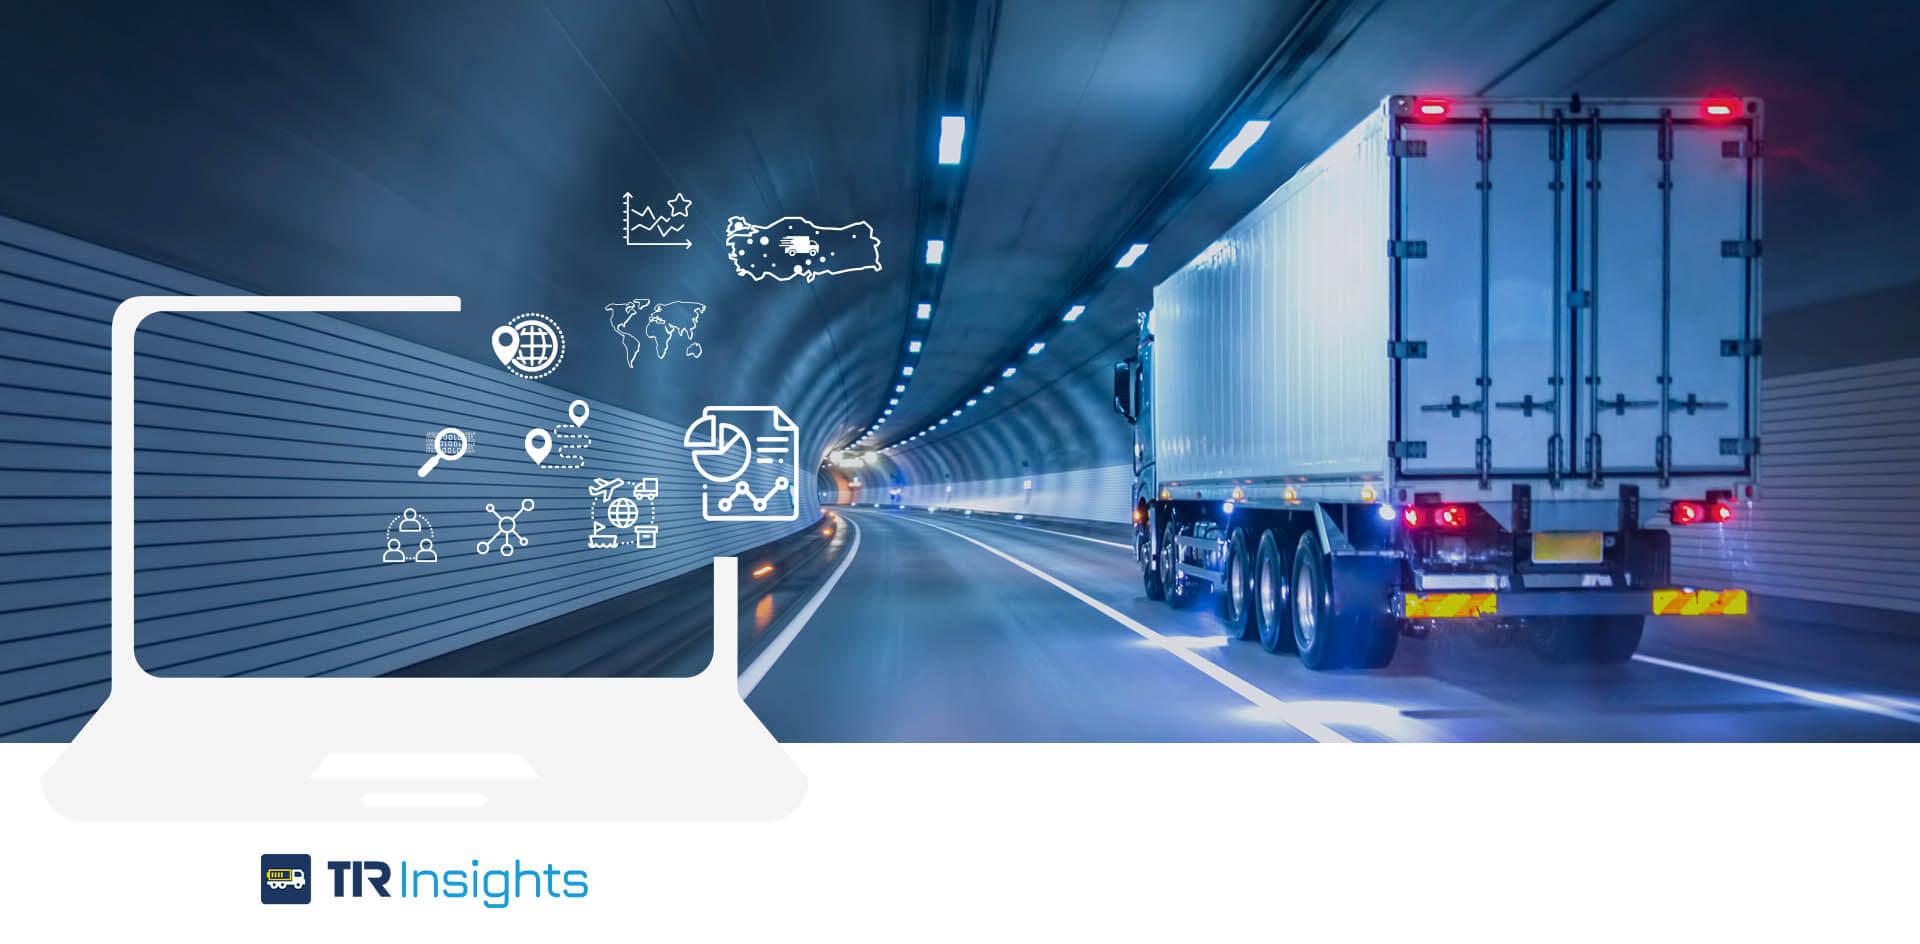 TIRPORT Insights Hakkımızda